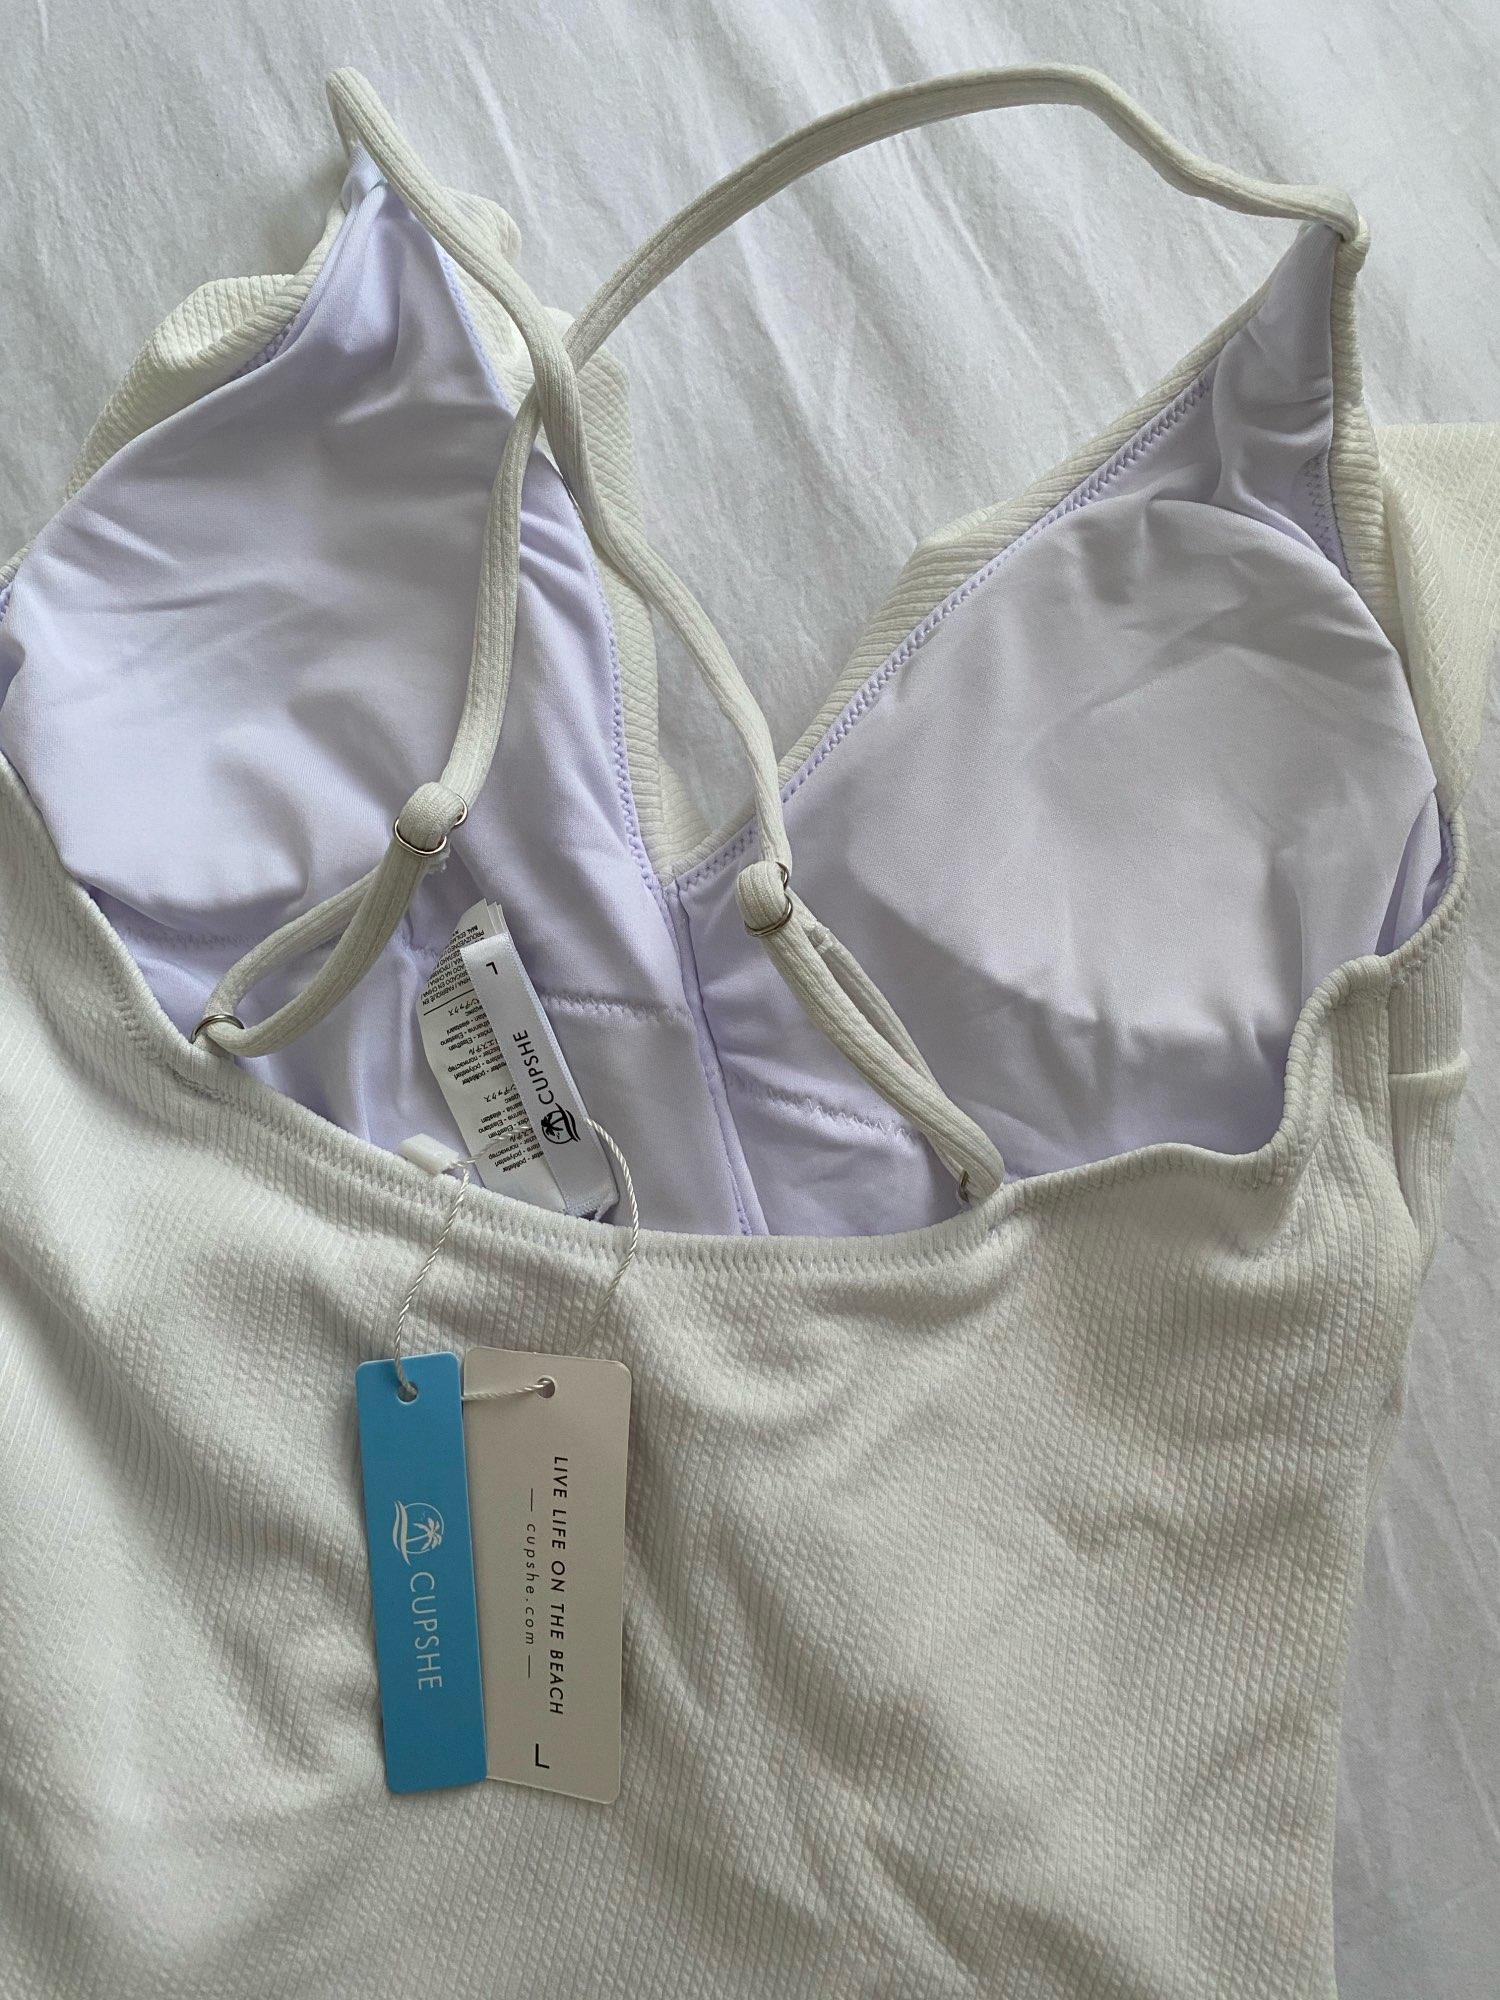 CUPSHE Happy Ending Yellow Solid One piece Swimsuit Falbala V neck Ruffle Sexy Monokini 2021 Ladies Beach Bathing Suit Swimwear|swimwear ladies|one-piece suitswimwear bathing suit - AliExpress